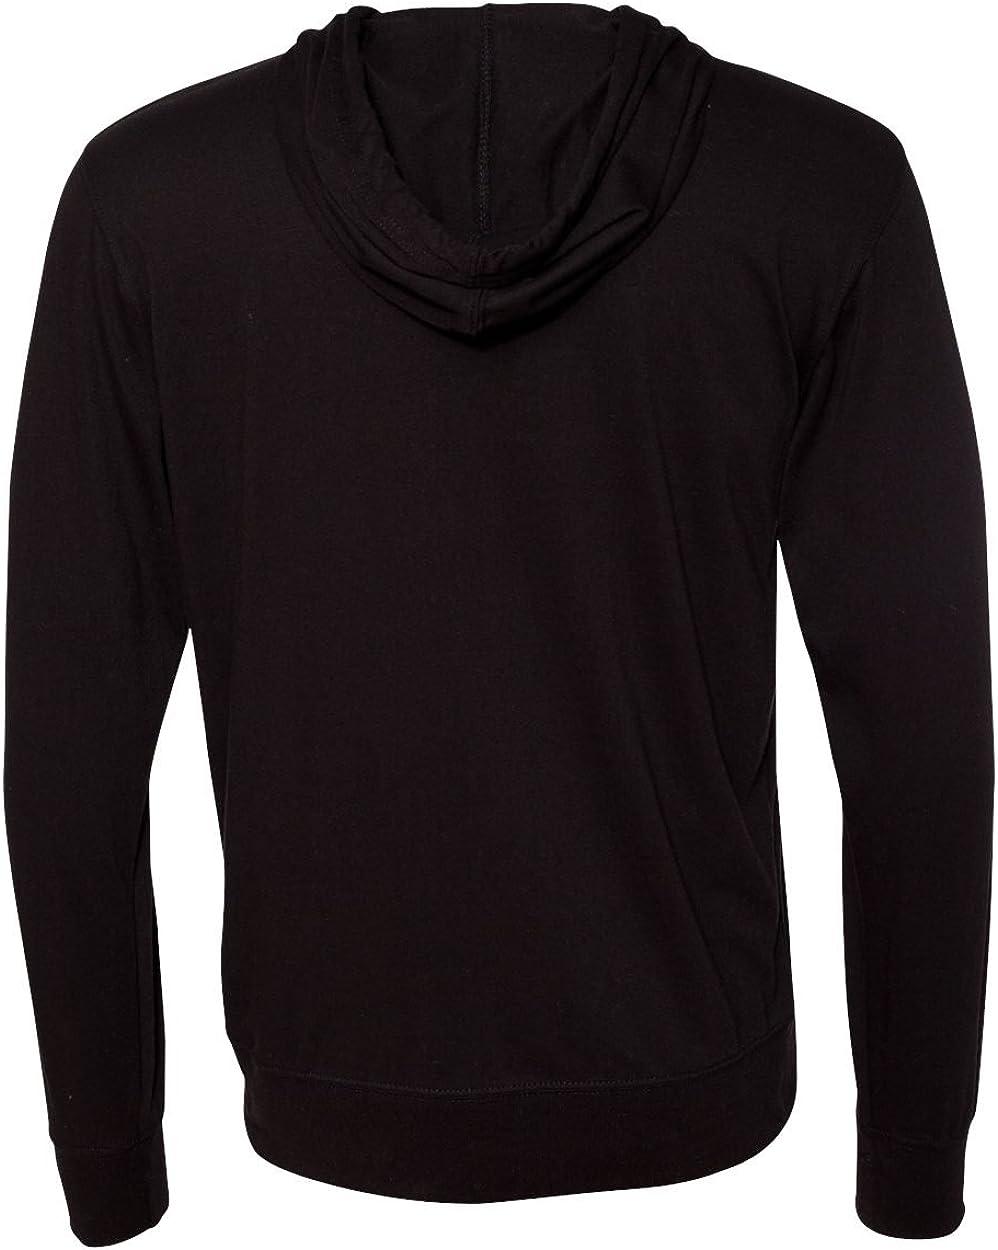 Mens Lightweight Jersey Hooded Full-Zip T-Shirt Hoodies in Sizes XS-2XL